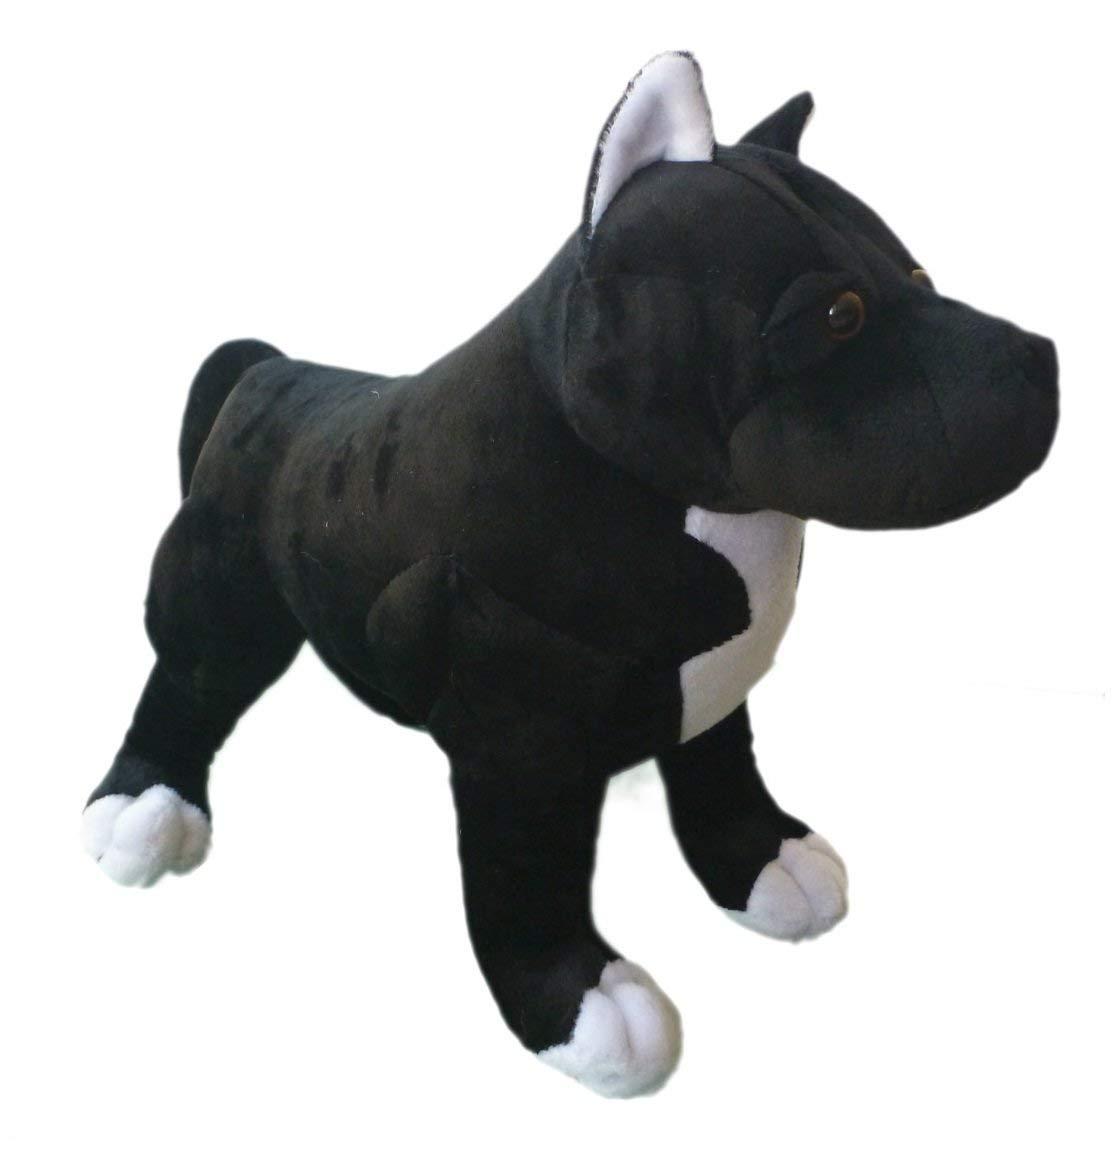 Cheap Dog Sex Plush Animal Find Dog Sex Plush Animal Deals On Line